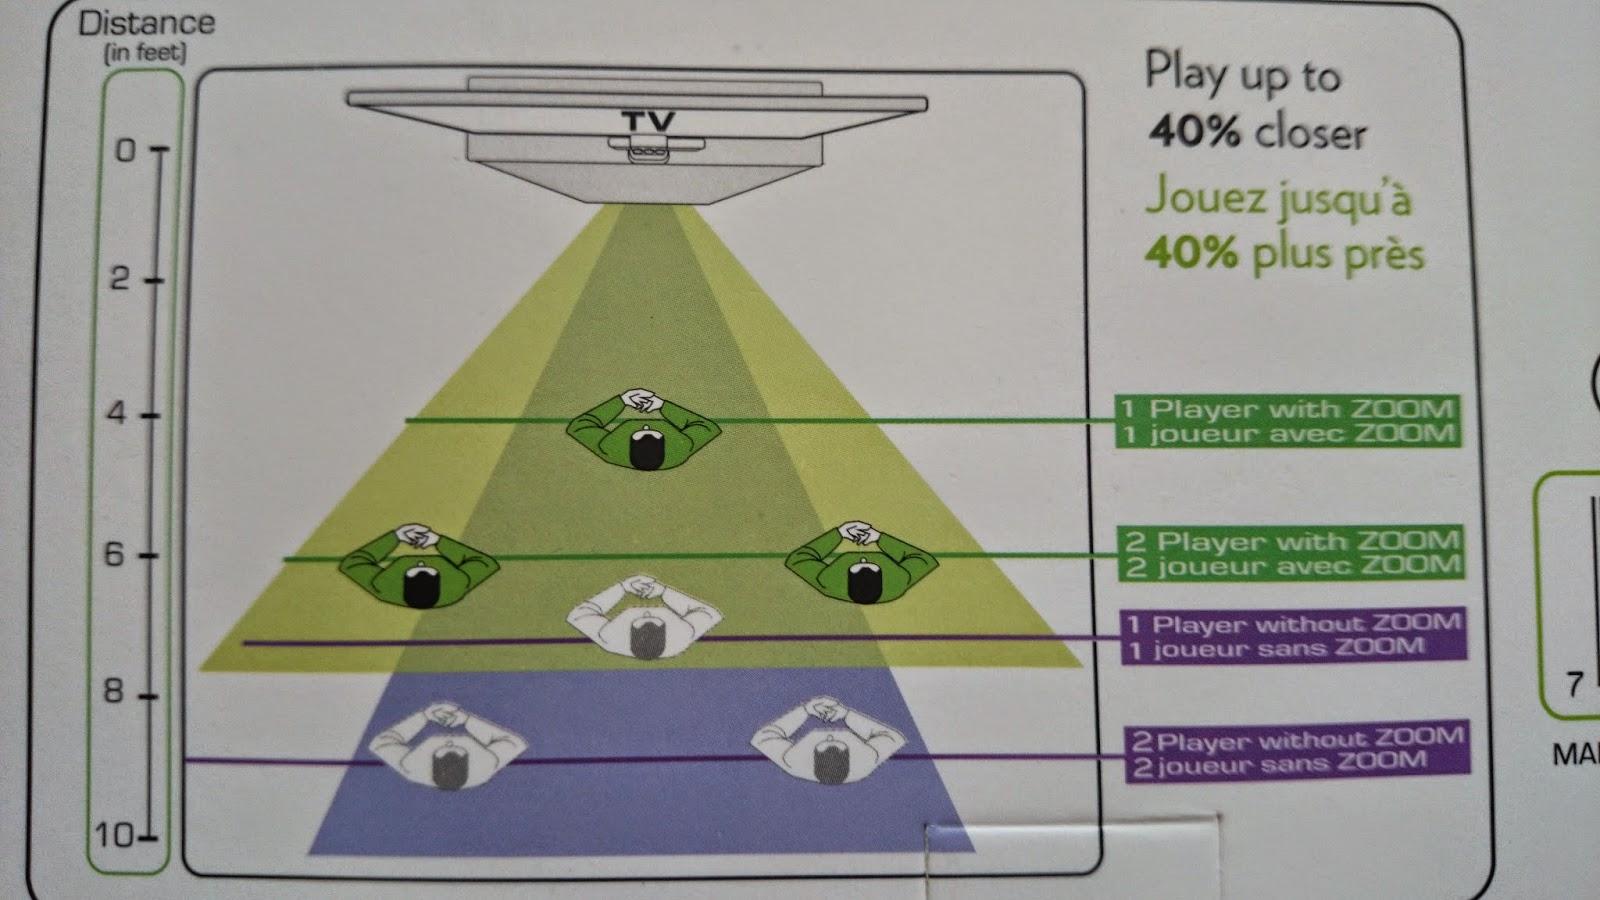 Xbox 360 Kinect Nyko Zoom opinia